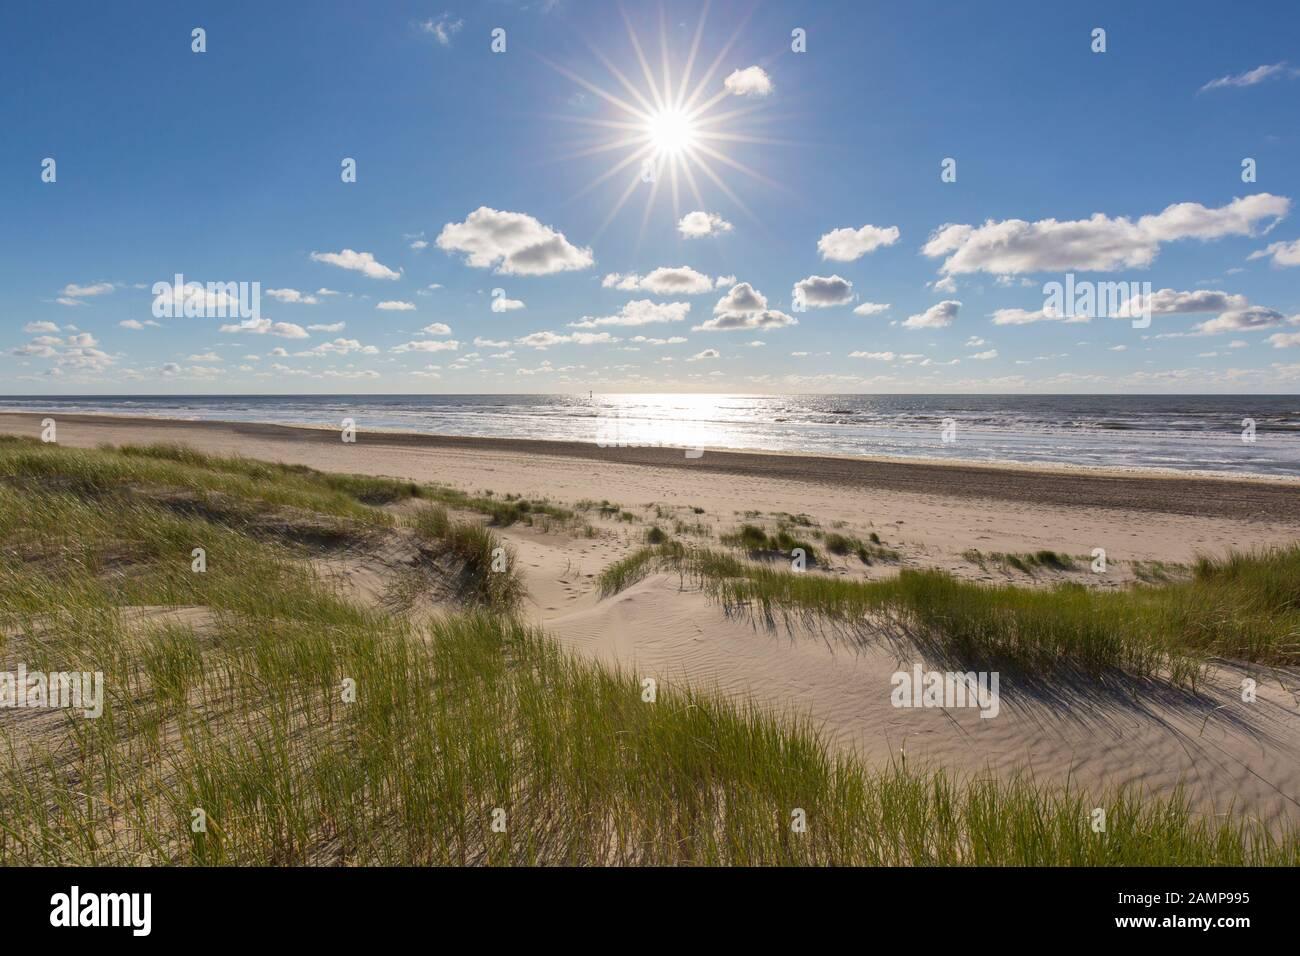 Beach and European marram grass / beachgrass (Ammophila arenaria) in the dunes on Texel, West Frisian Island in the Wadden Sea, the Netherlands Stock Photo